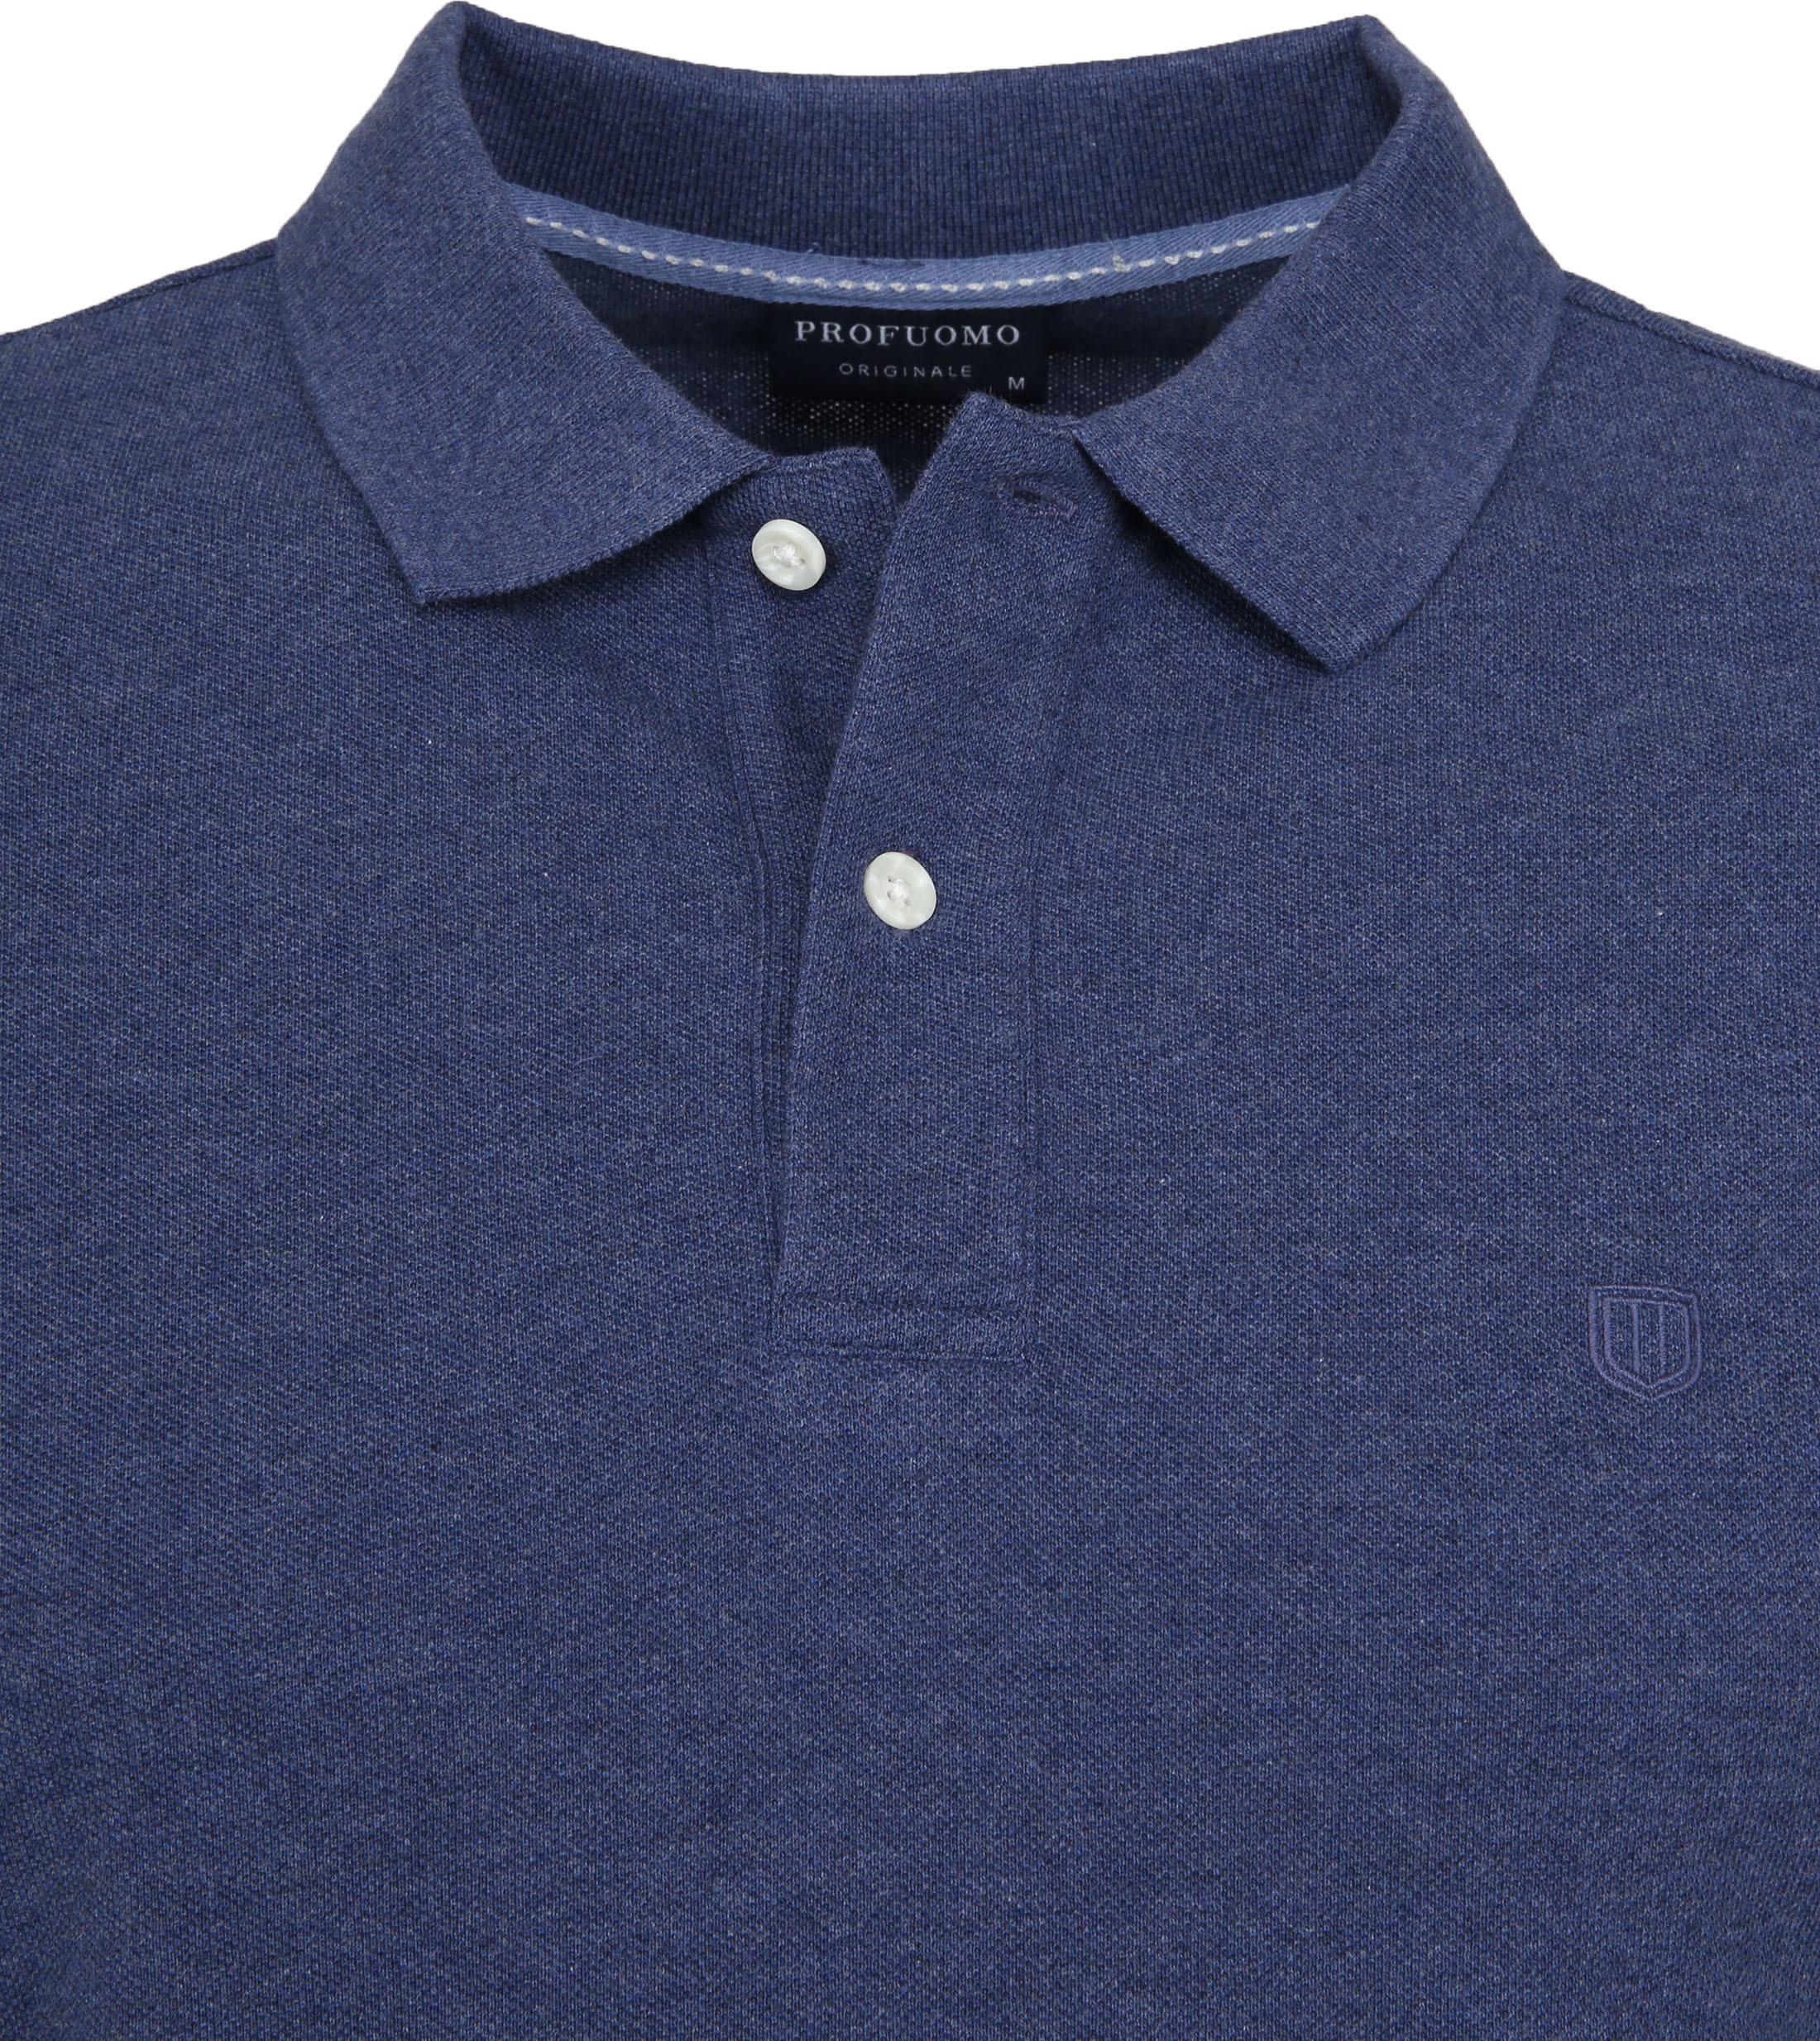 Profuomo Short Sleeve Poloshirt Indigo foto 1